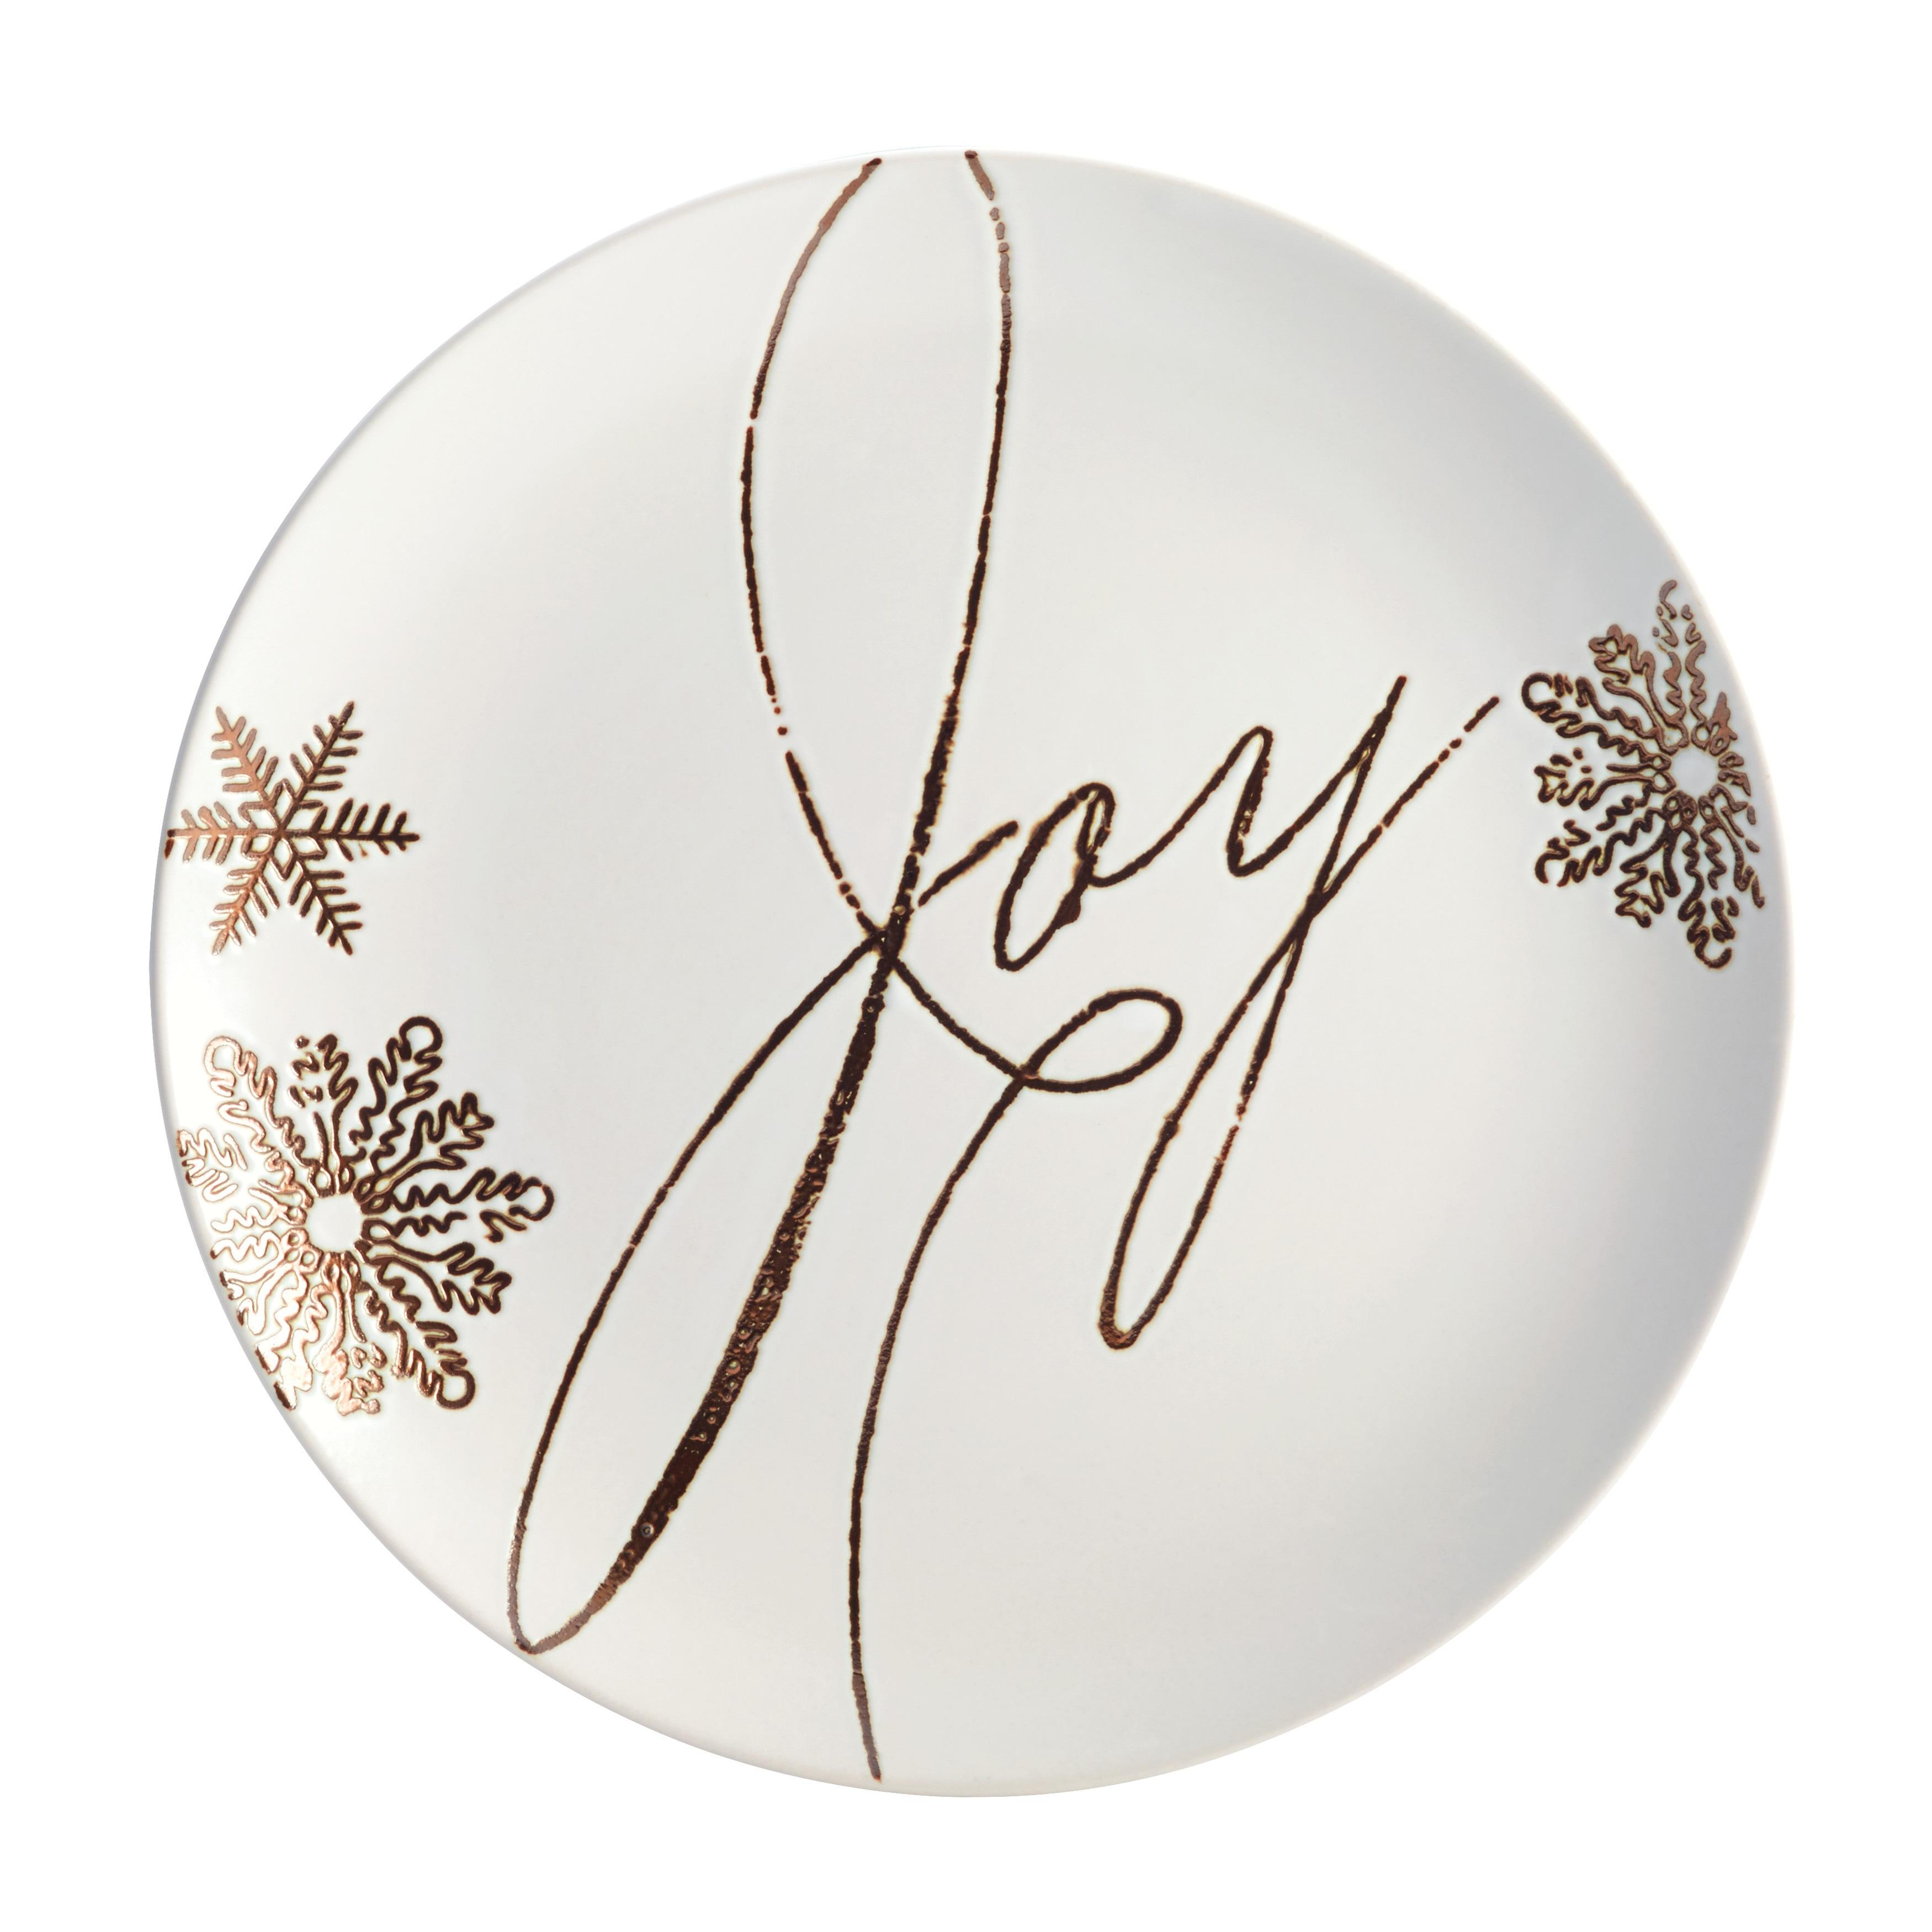 Paula Deen(r) Dinnerware Stoneware Holiday Salad/Dessert Plate Set 4-Piece Winter Charm Pattern Cream - Free Shipping On Orders Over $45 - Overstock - ...  sc 1 st  Overstock.com & Paula Deen(r) Dinnerware Stoneware Holiday Salad/Dessert Plate Set ...